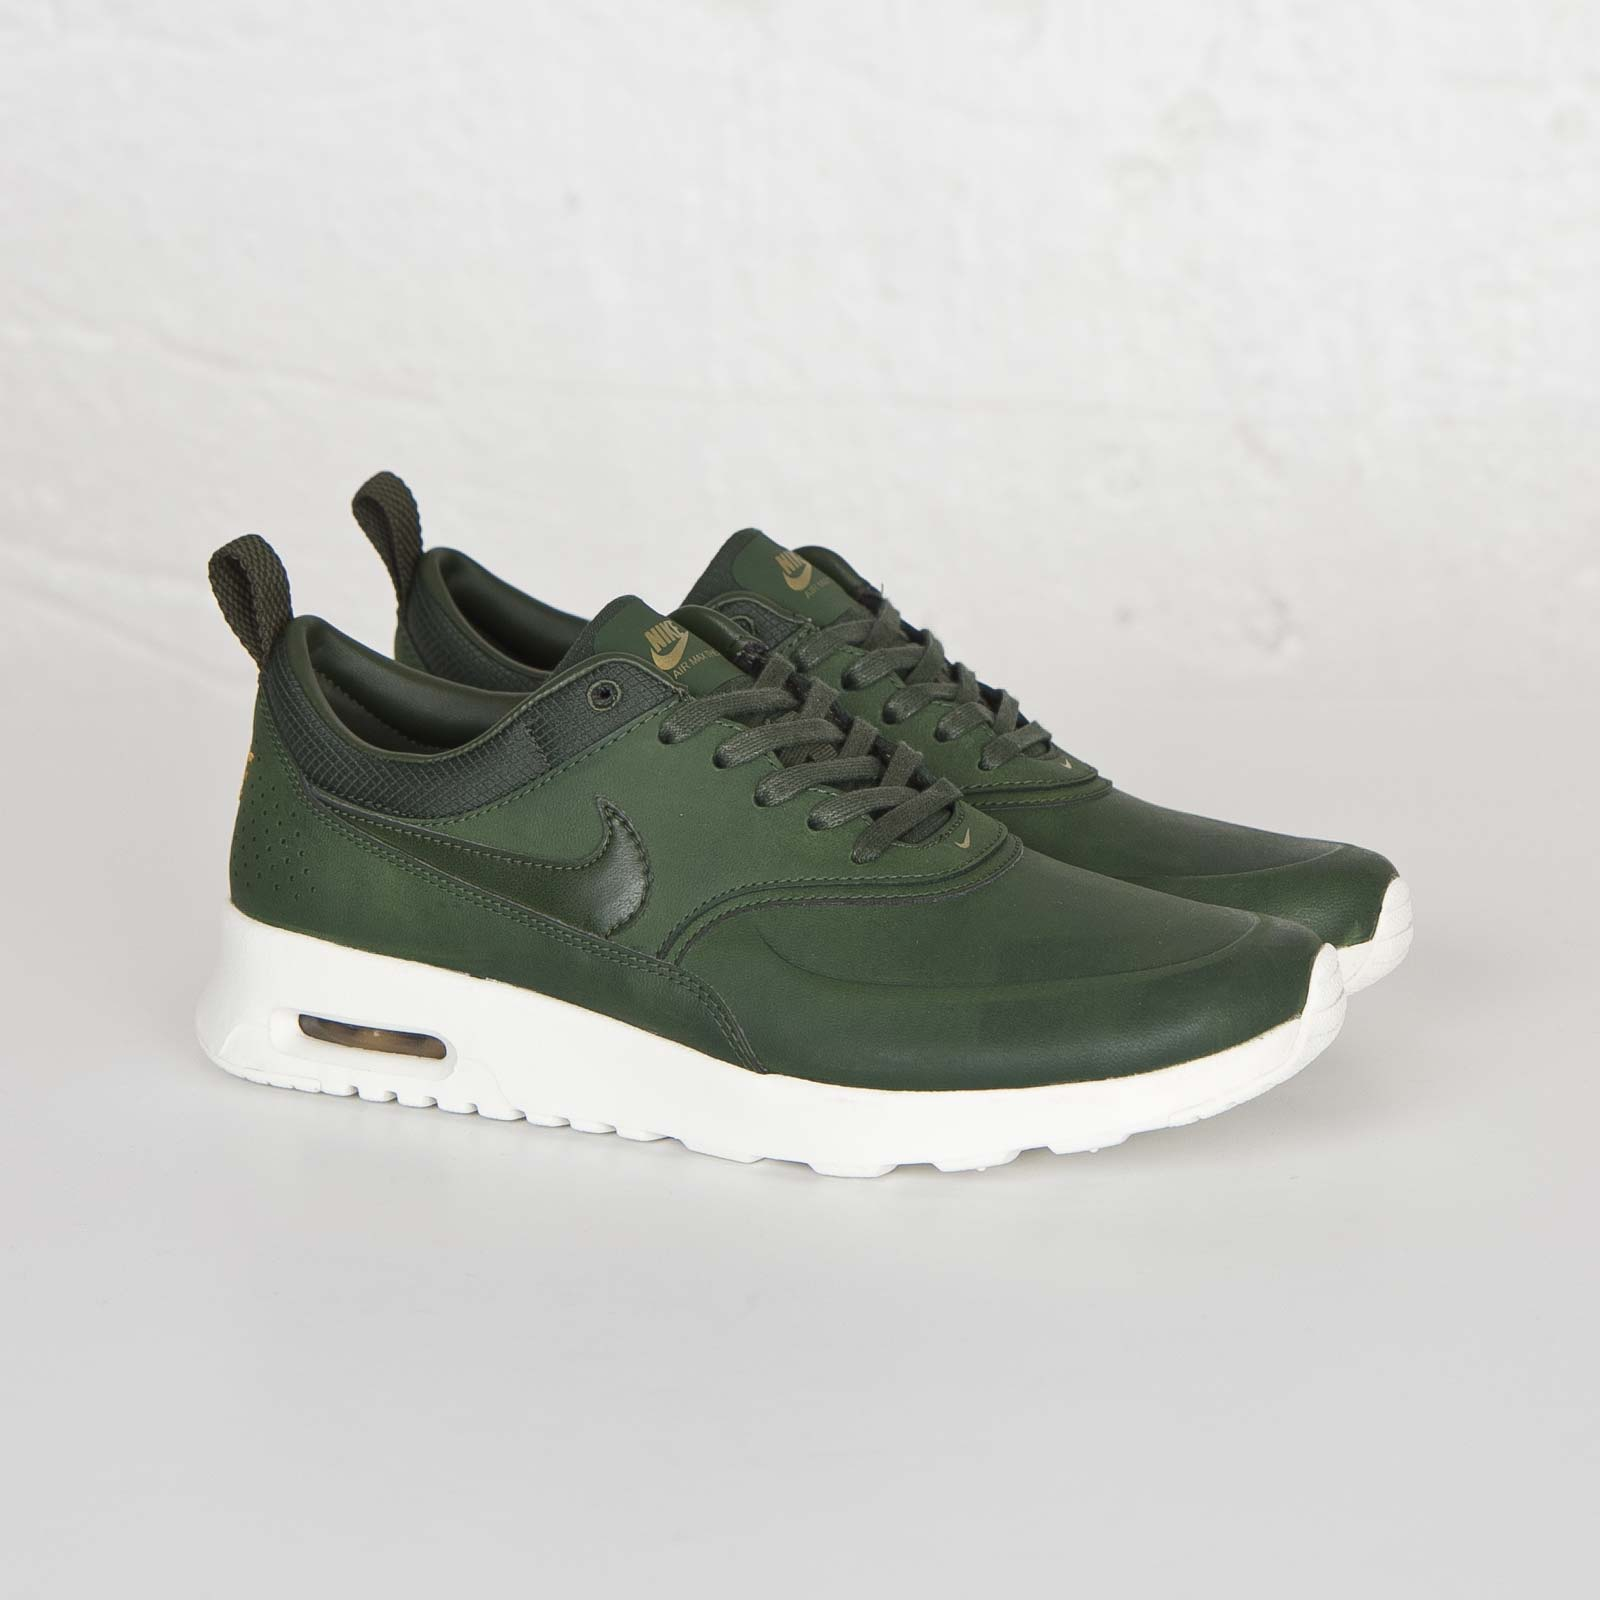 0950d1e732 Nike Wmns Air Max Thea Premium - 616723-304 - Sneakersnstuff ...